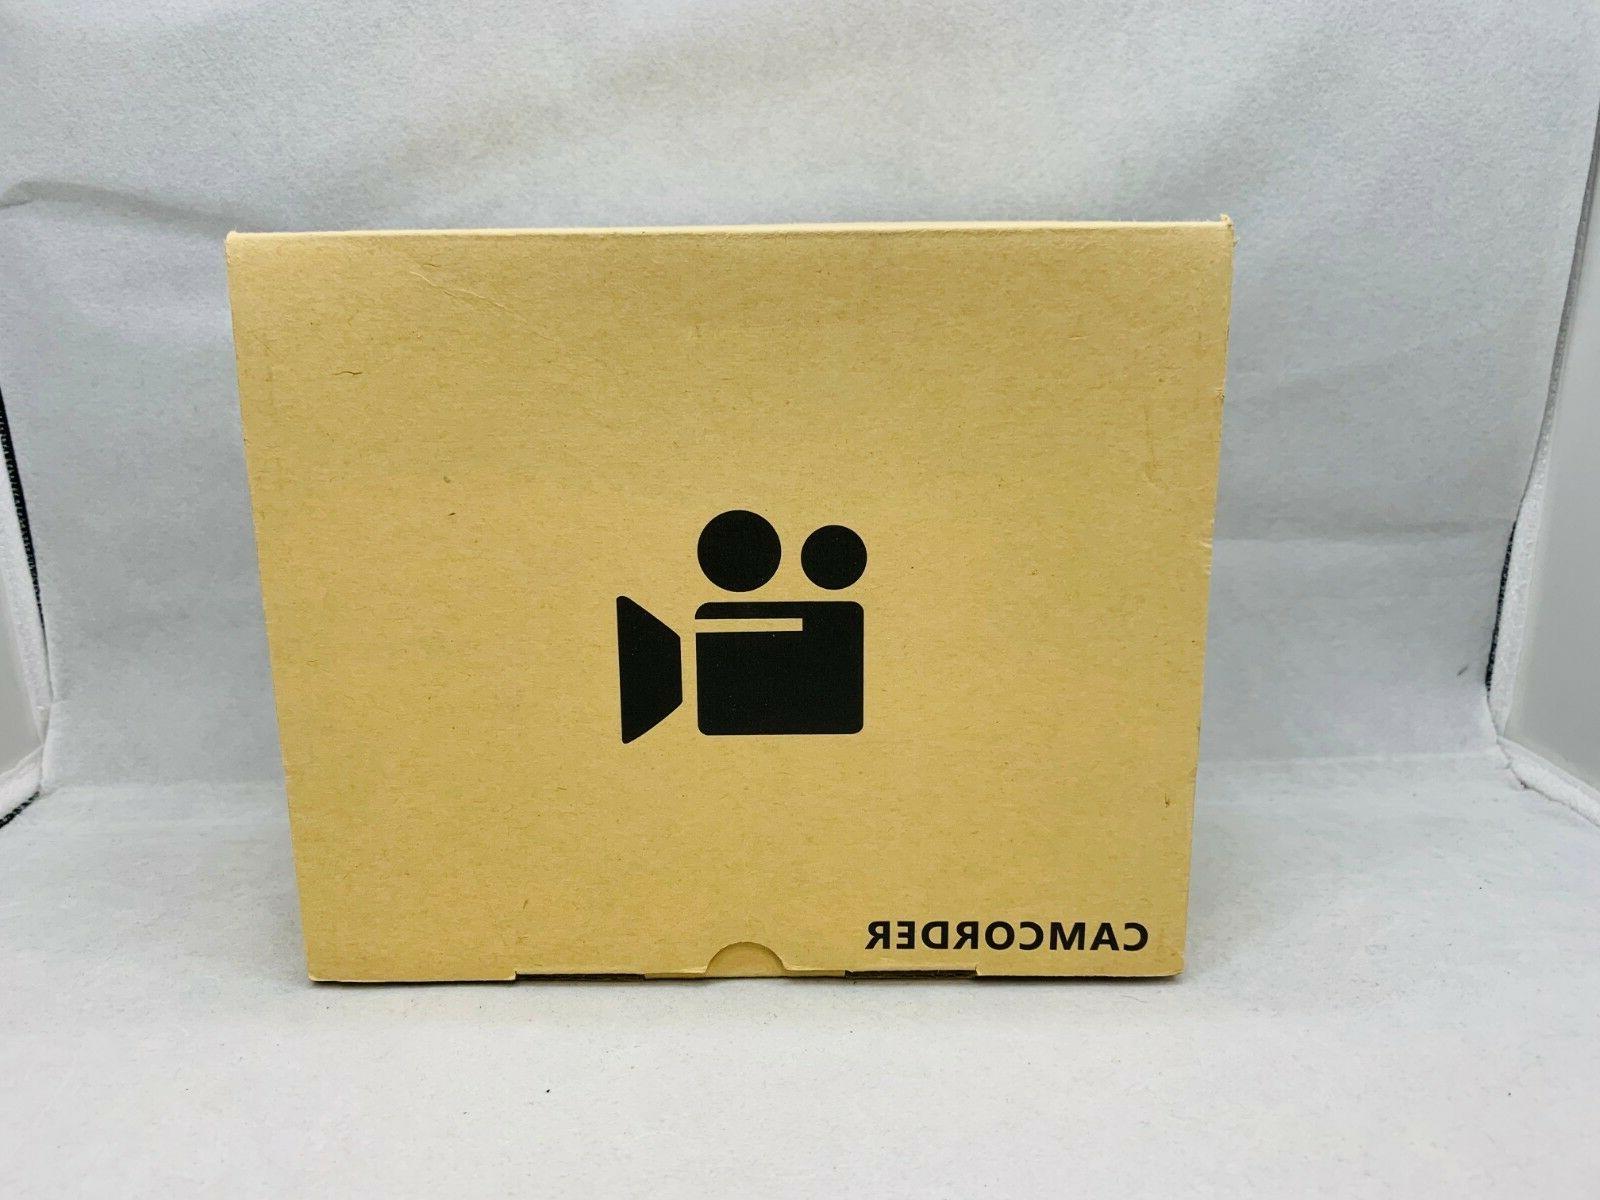 SEREE Camcorder 1080P 24.0 HDMI Cable 18× Zoom